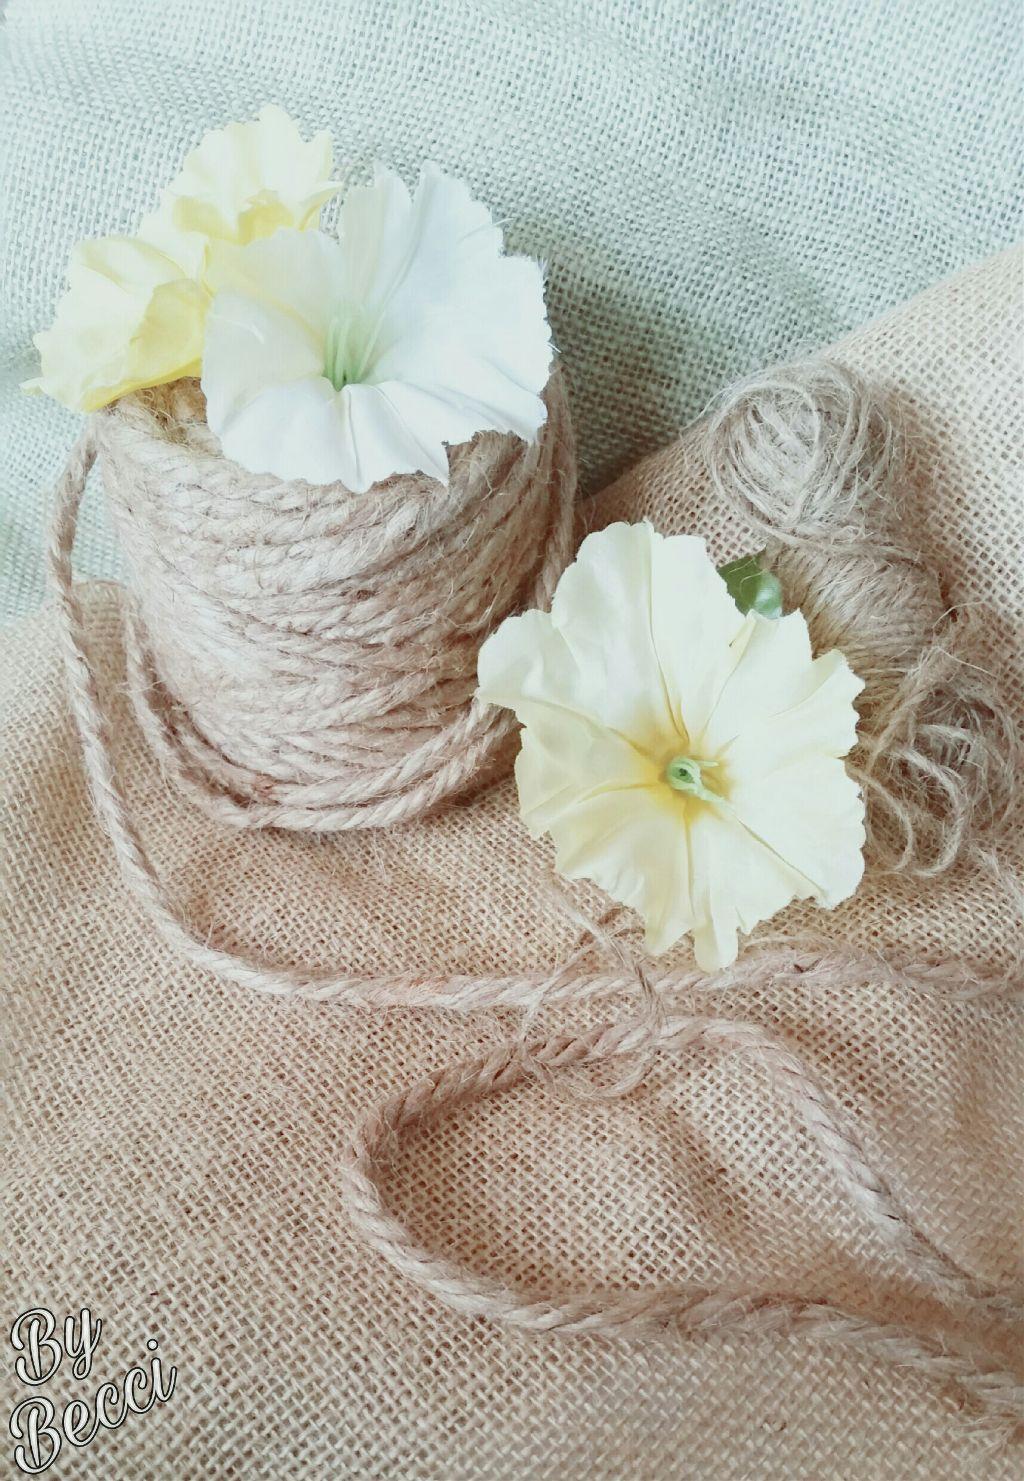 #Textiles #FreeToEdit #remixit #textile #burlap #rope #photography #like #likeit